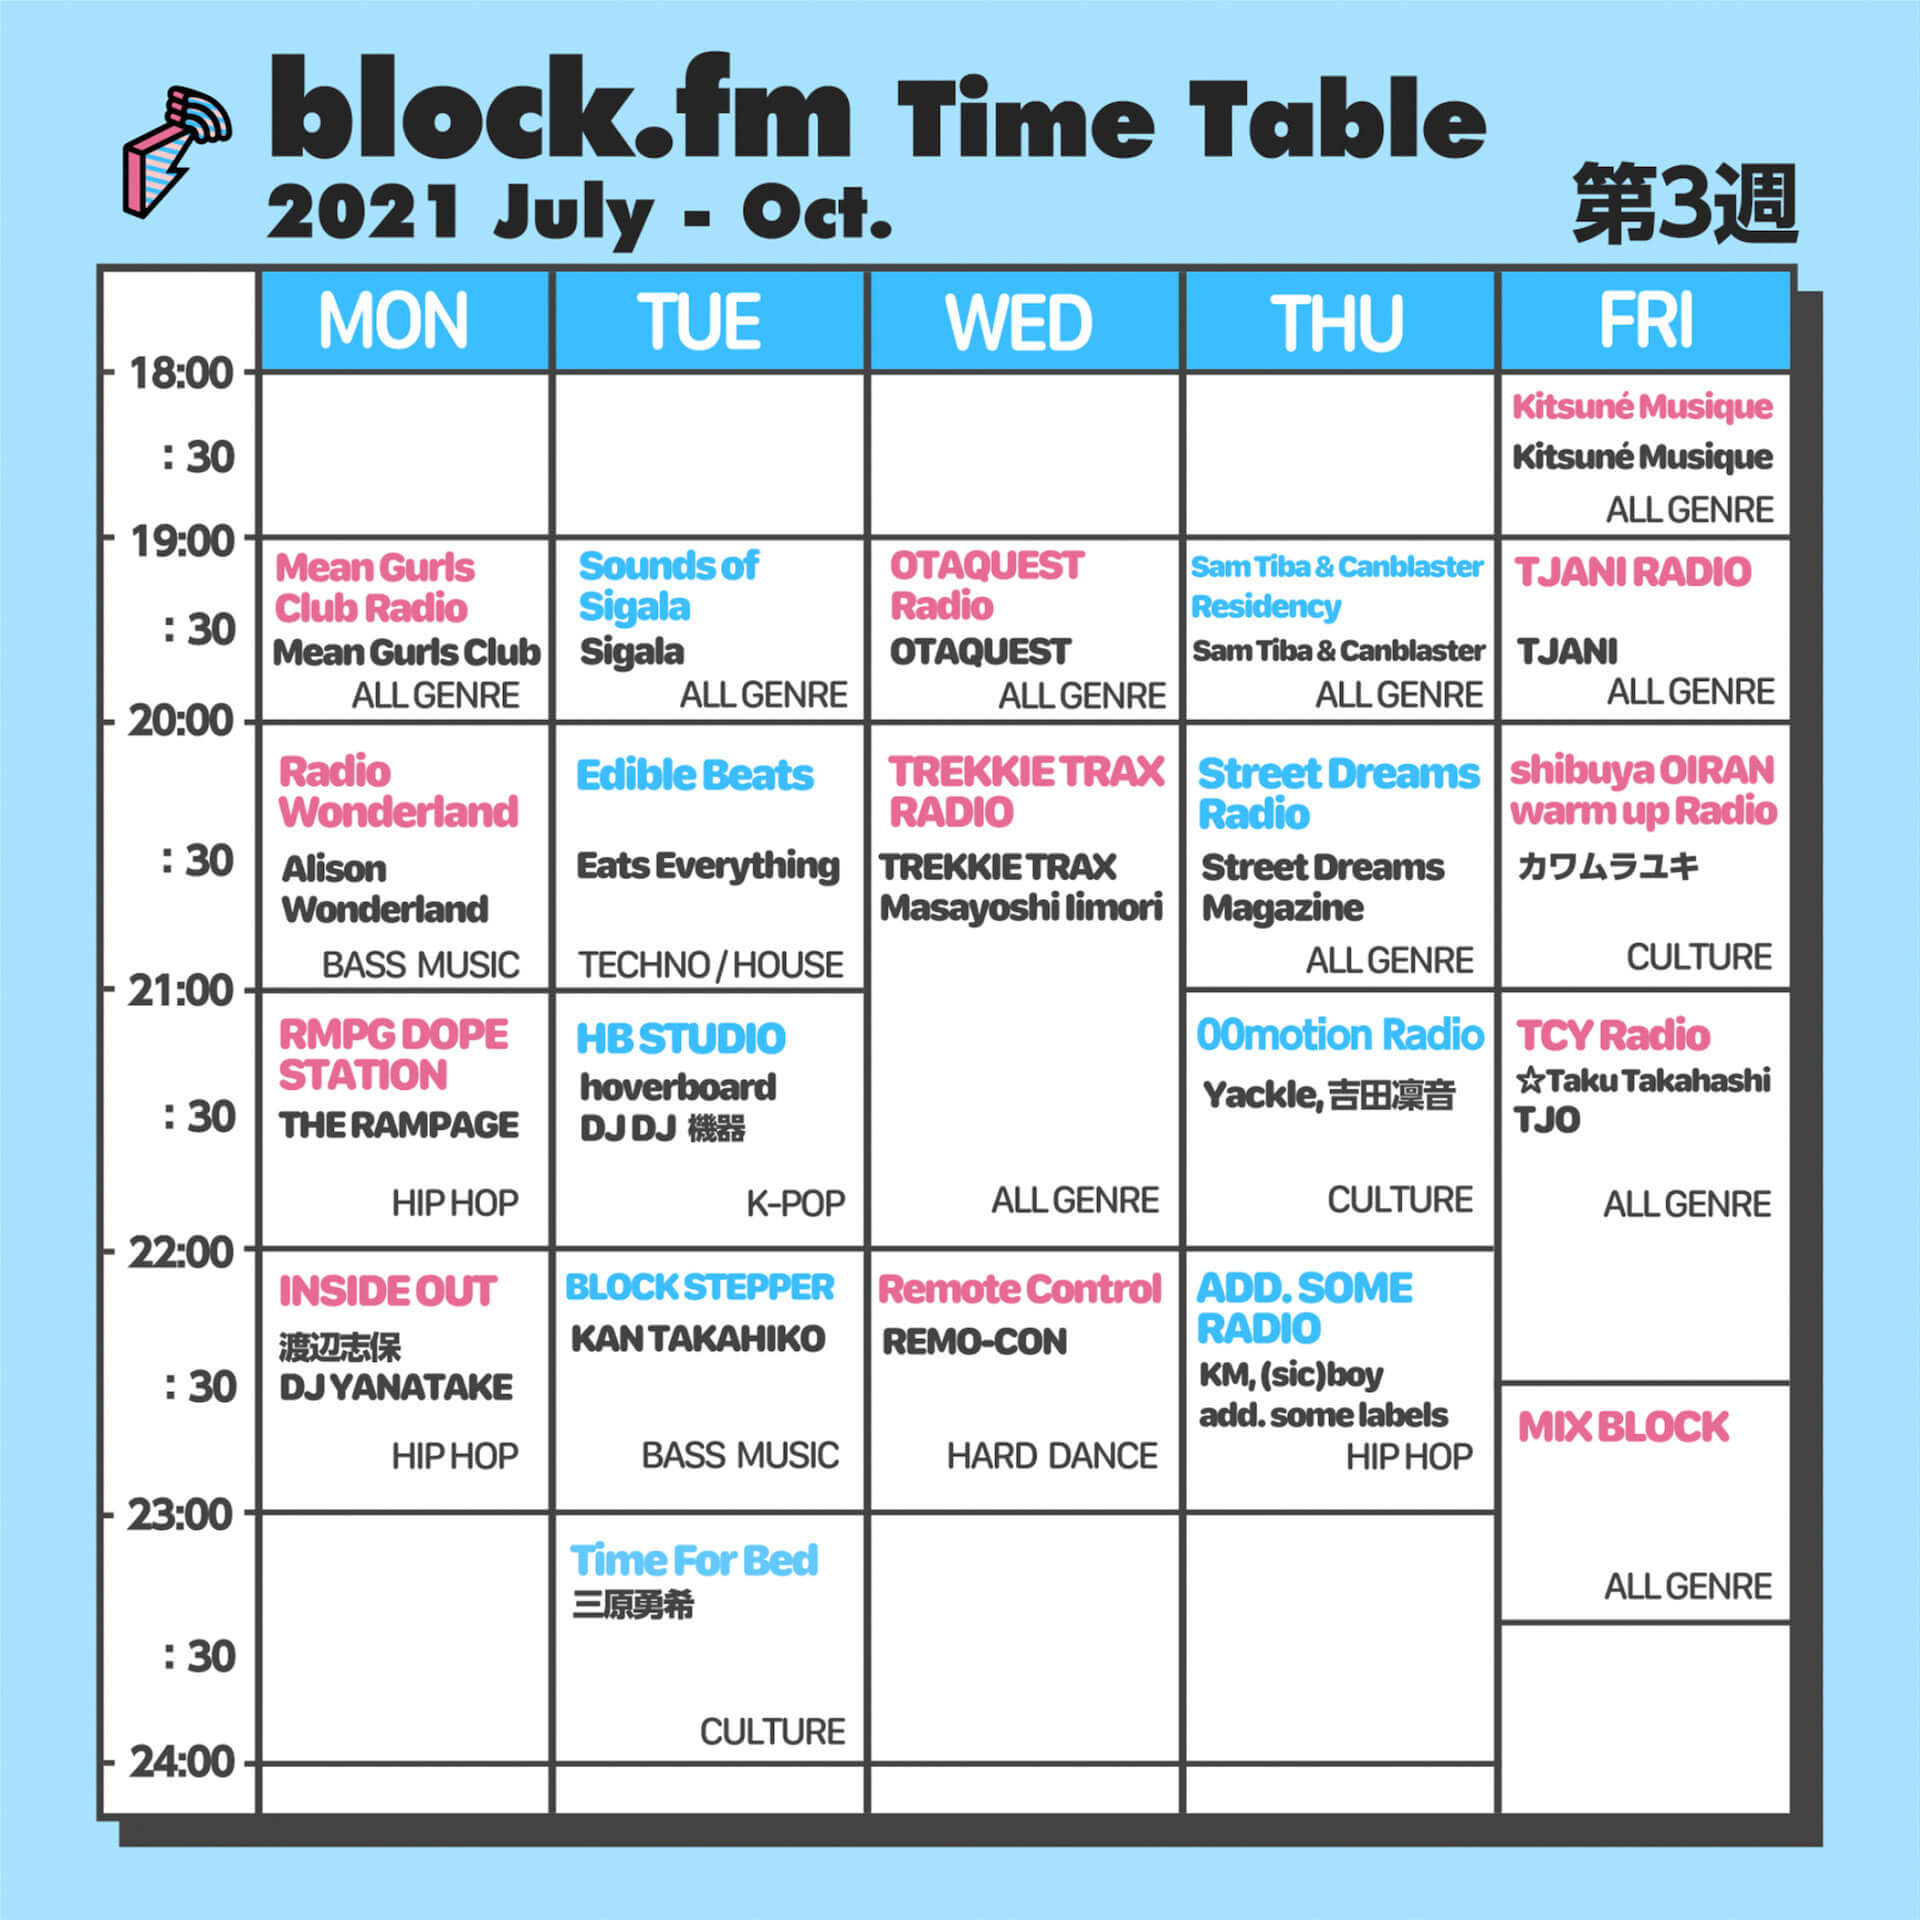 block.fmにて三原勇希のレギュラー番組『Time for Bed』が゙放送スタート!7月以降のラジオ放送スケジュールも公開 music_210702_Time-for-Bed7